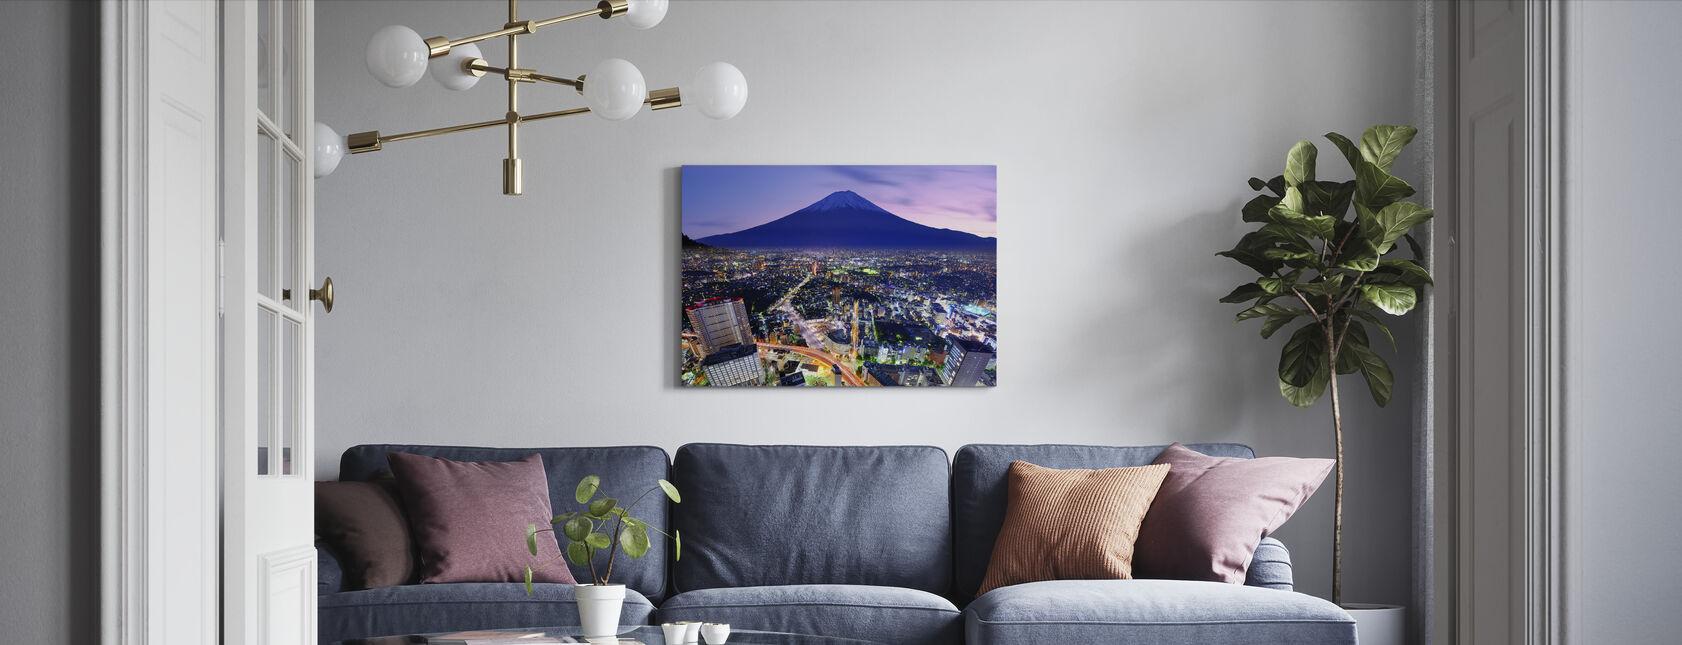 Uenon piirikunta ja Mt. Fuji in Tokio, Japani - Canvastaulu - Olohuone